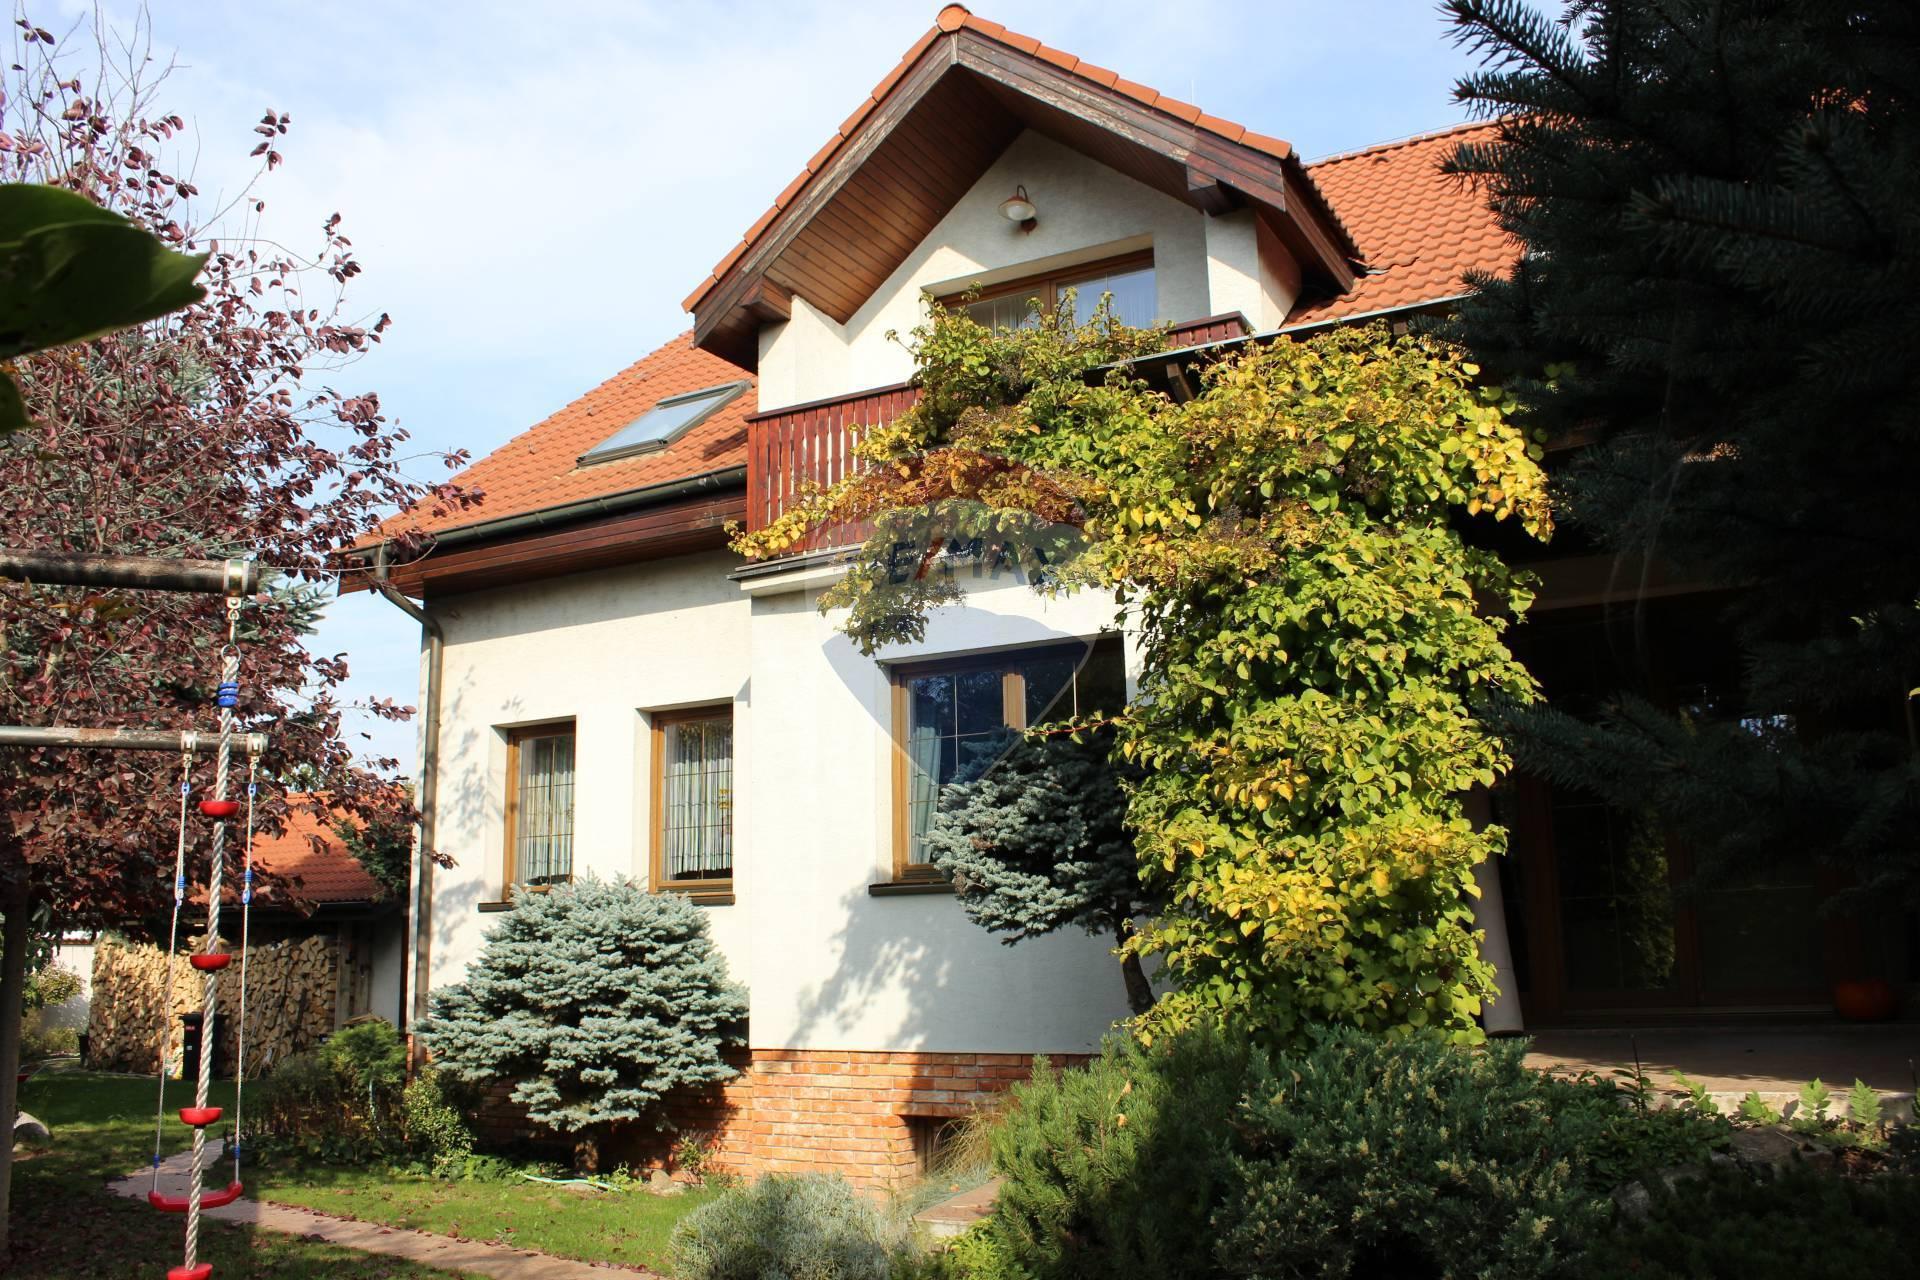 PREDAJ: 5 izb. RD, pozemok 559 m2, dvojgaráž, J. Smreka, Senec.